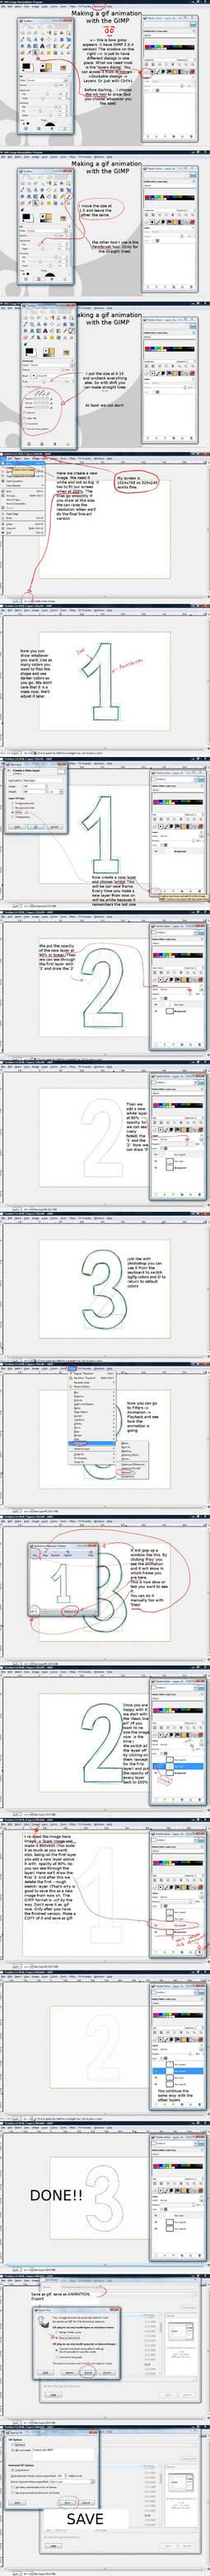 GIMP gif animation tutorial